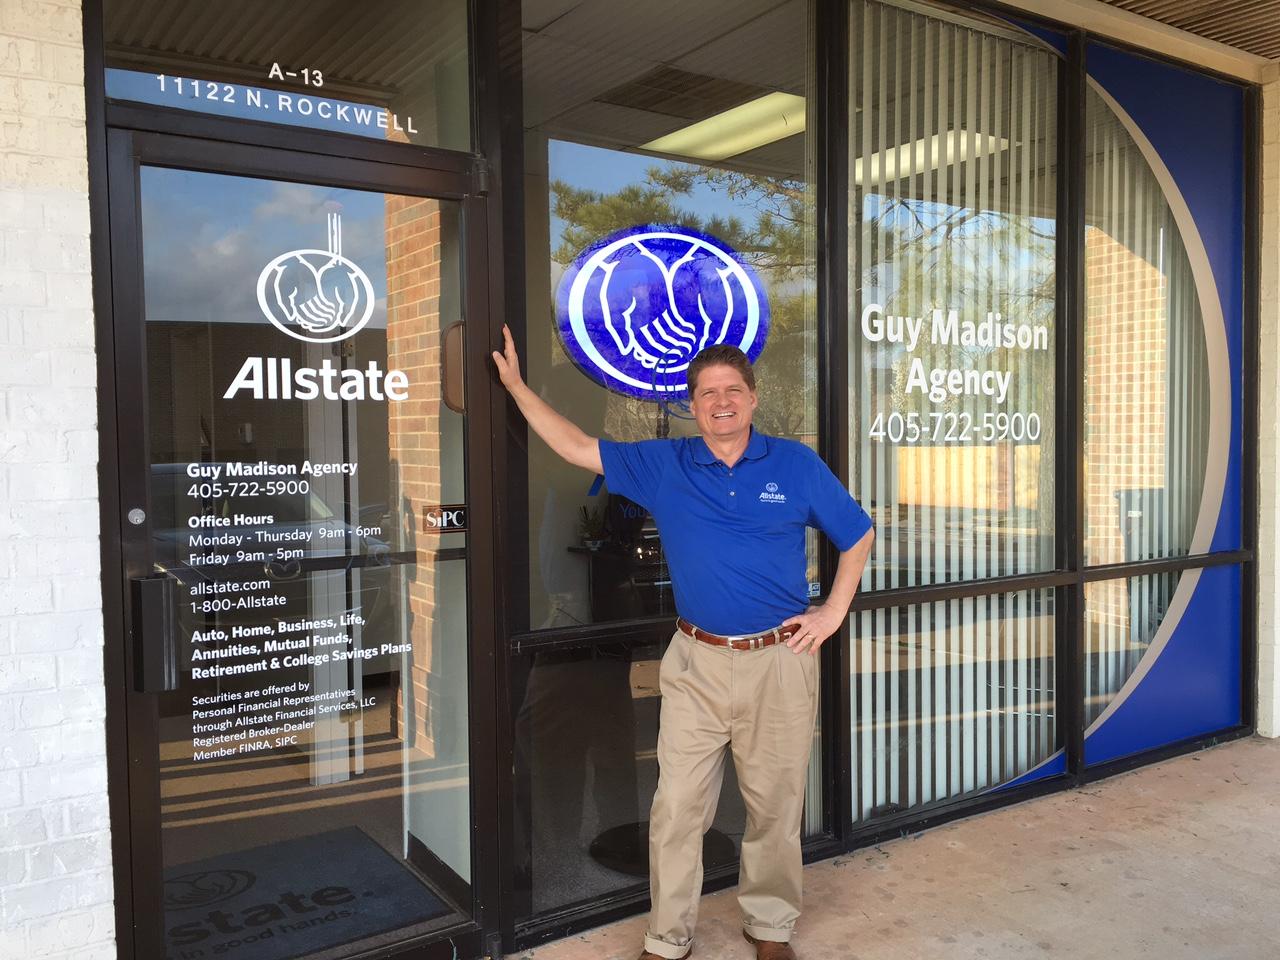 Allstate | Car Insurance in Oklahoma City, OK - Guy Madison